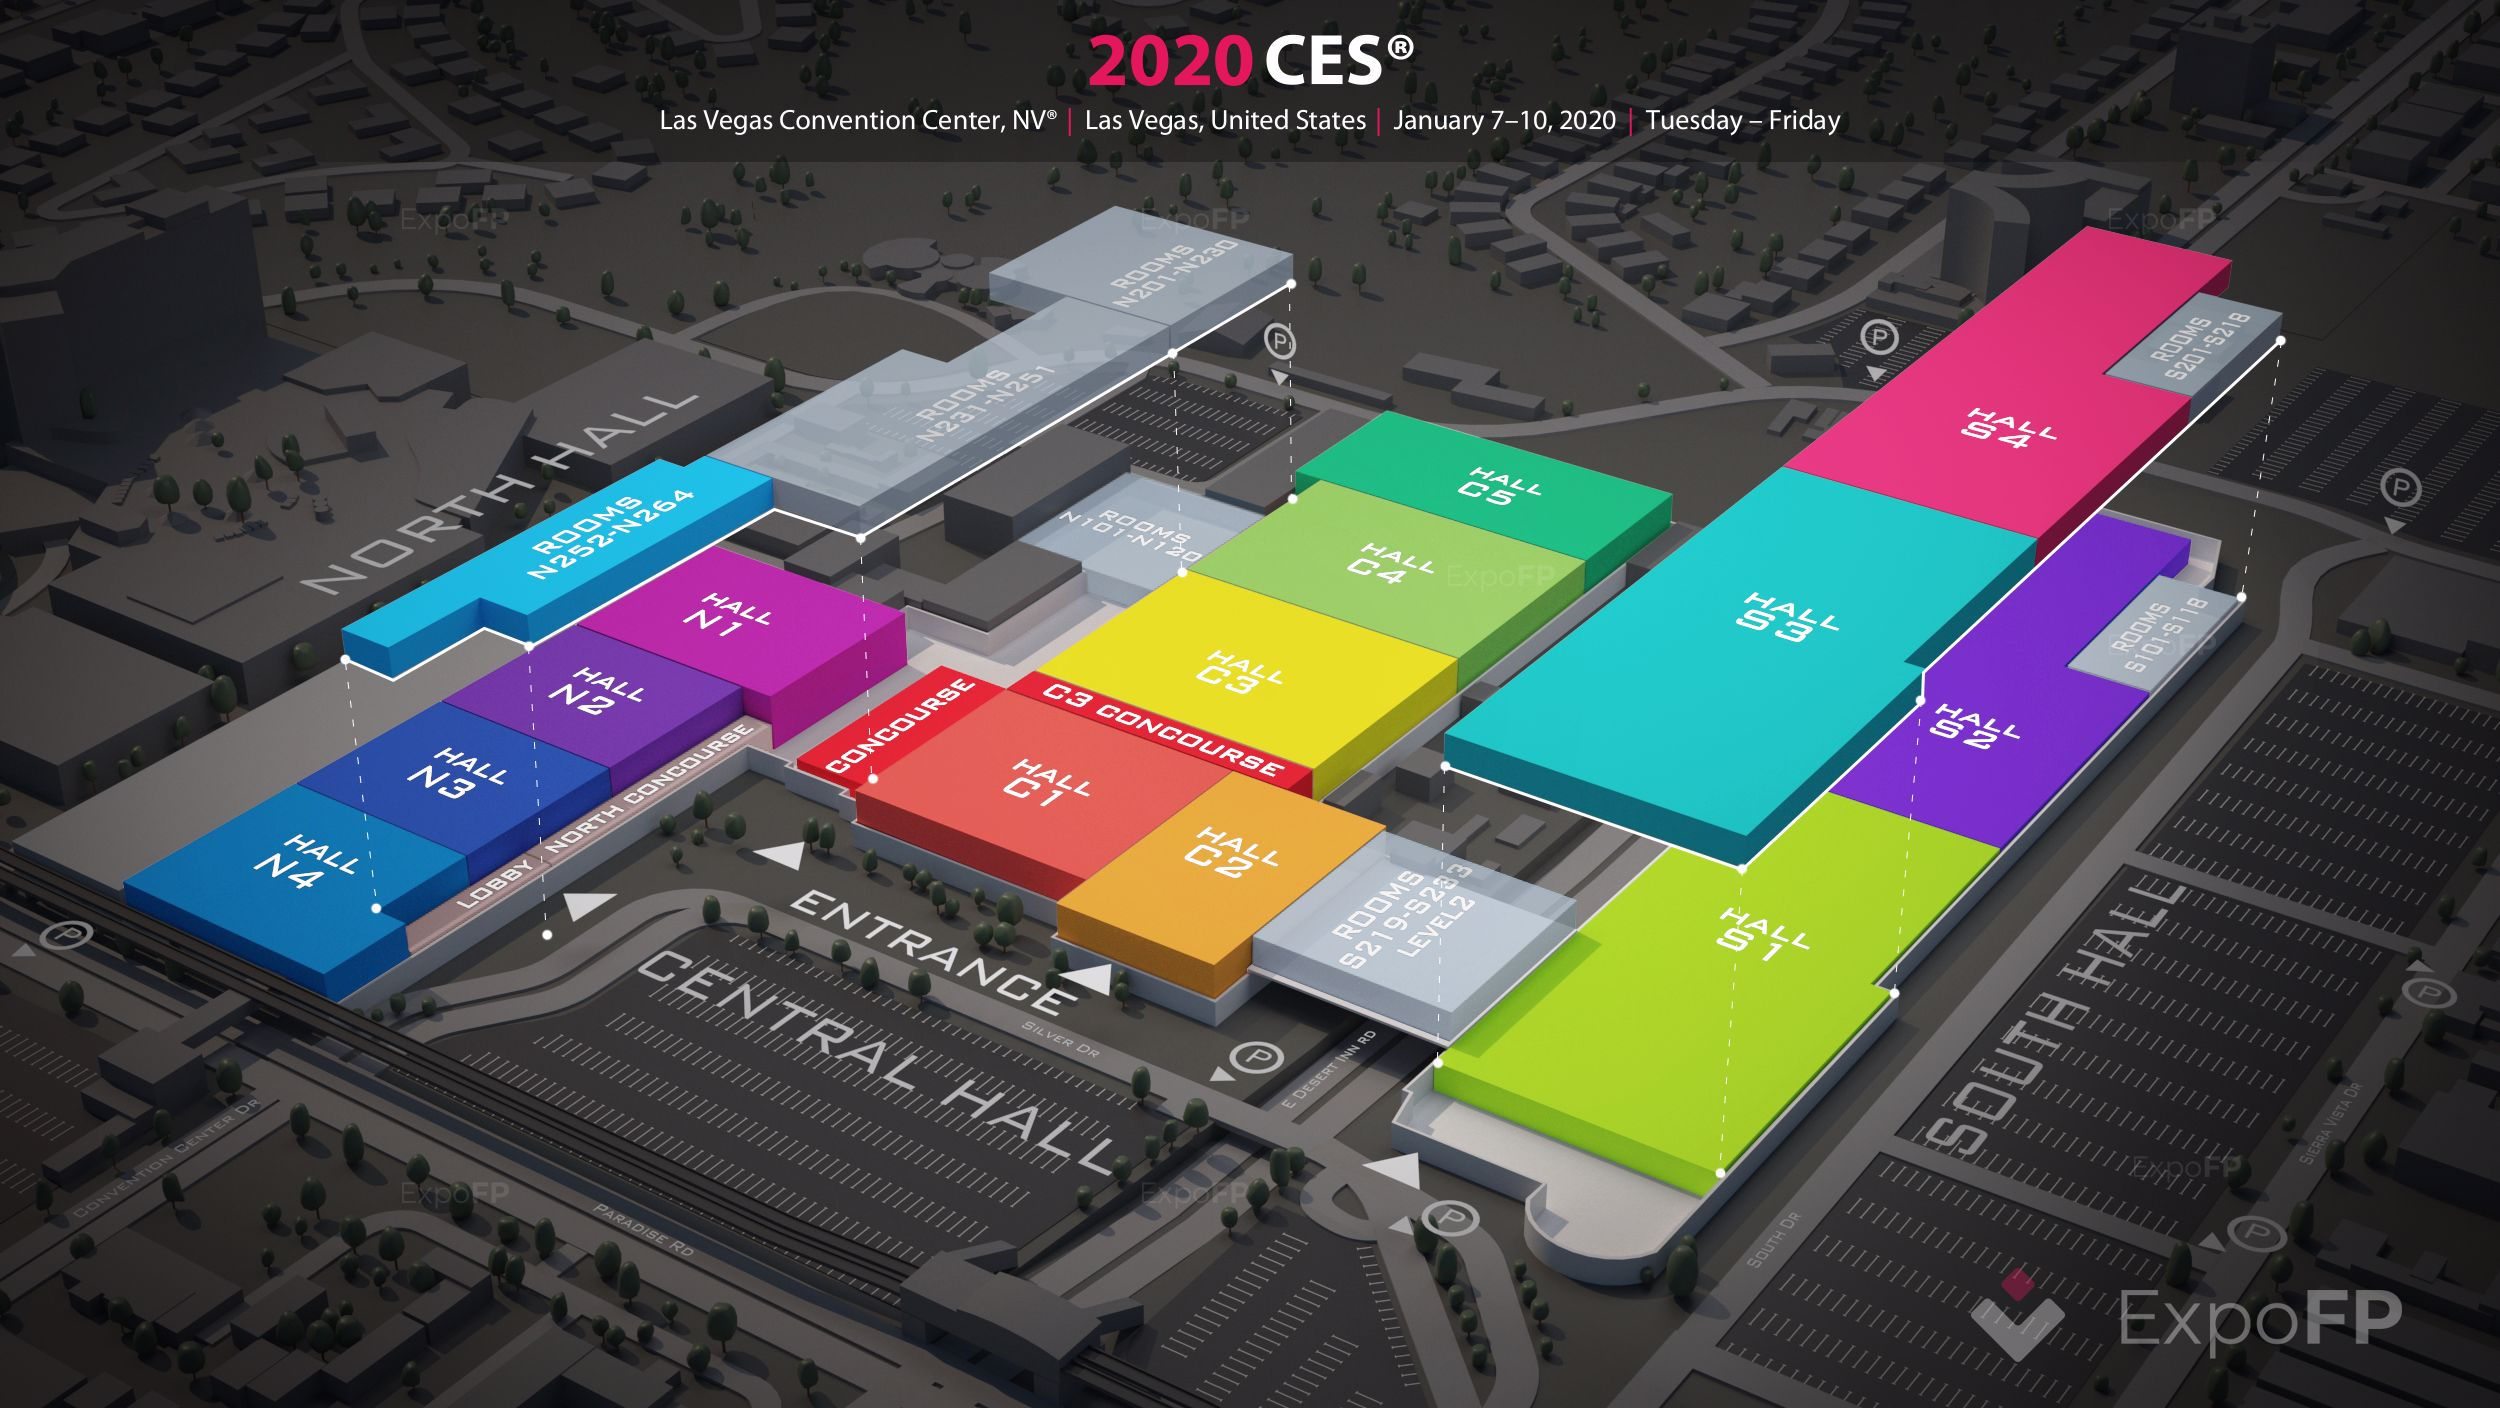 Ces 2020 In Las Vegas Convention Center Nv